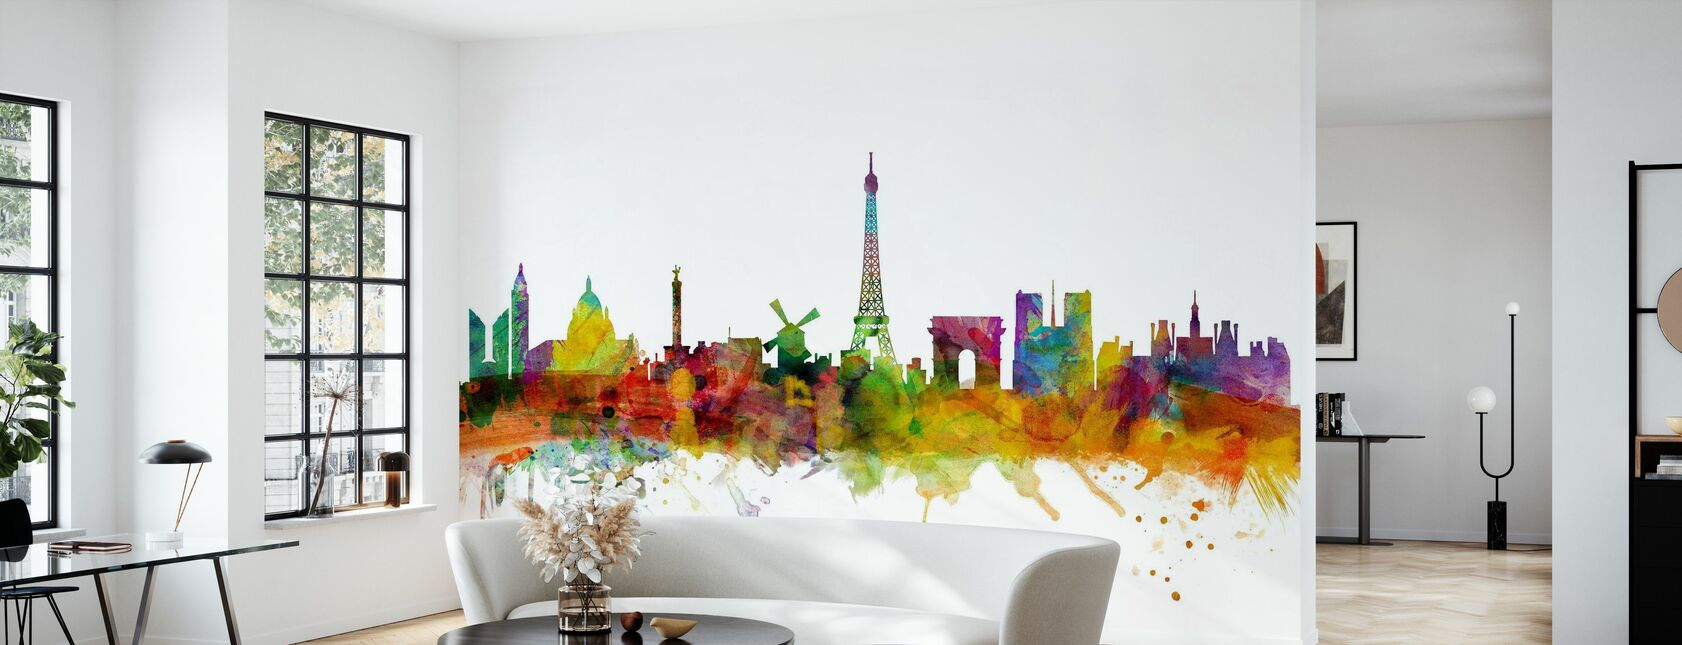 Paris Skyline - Wallpaper - Living Room